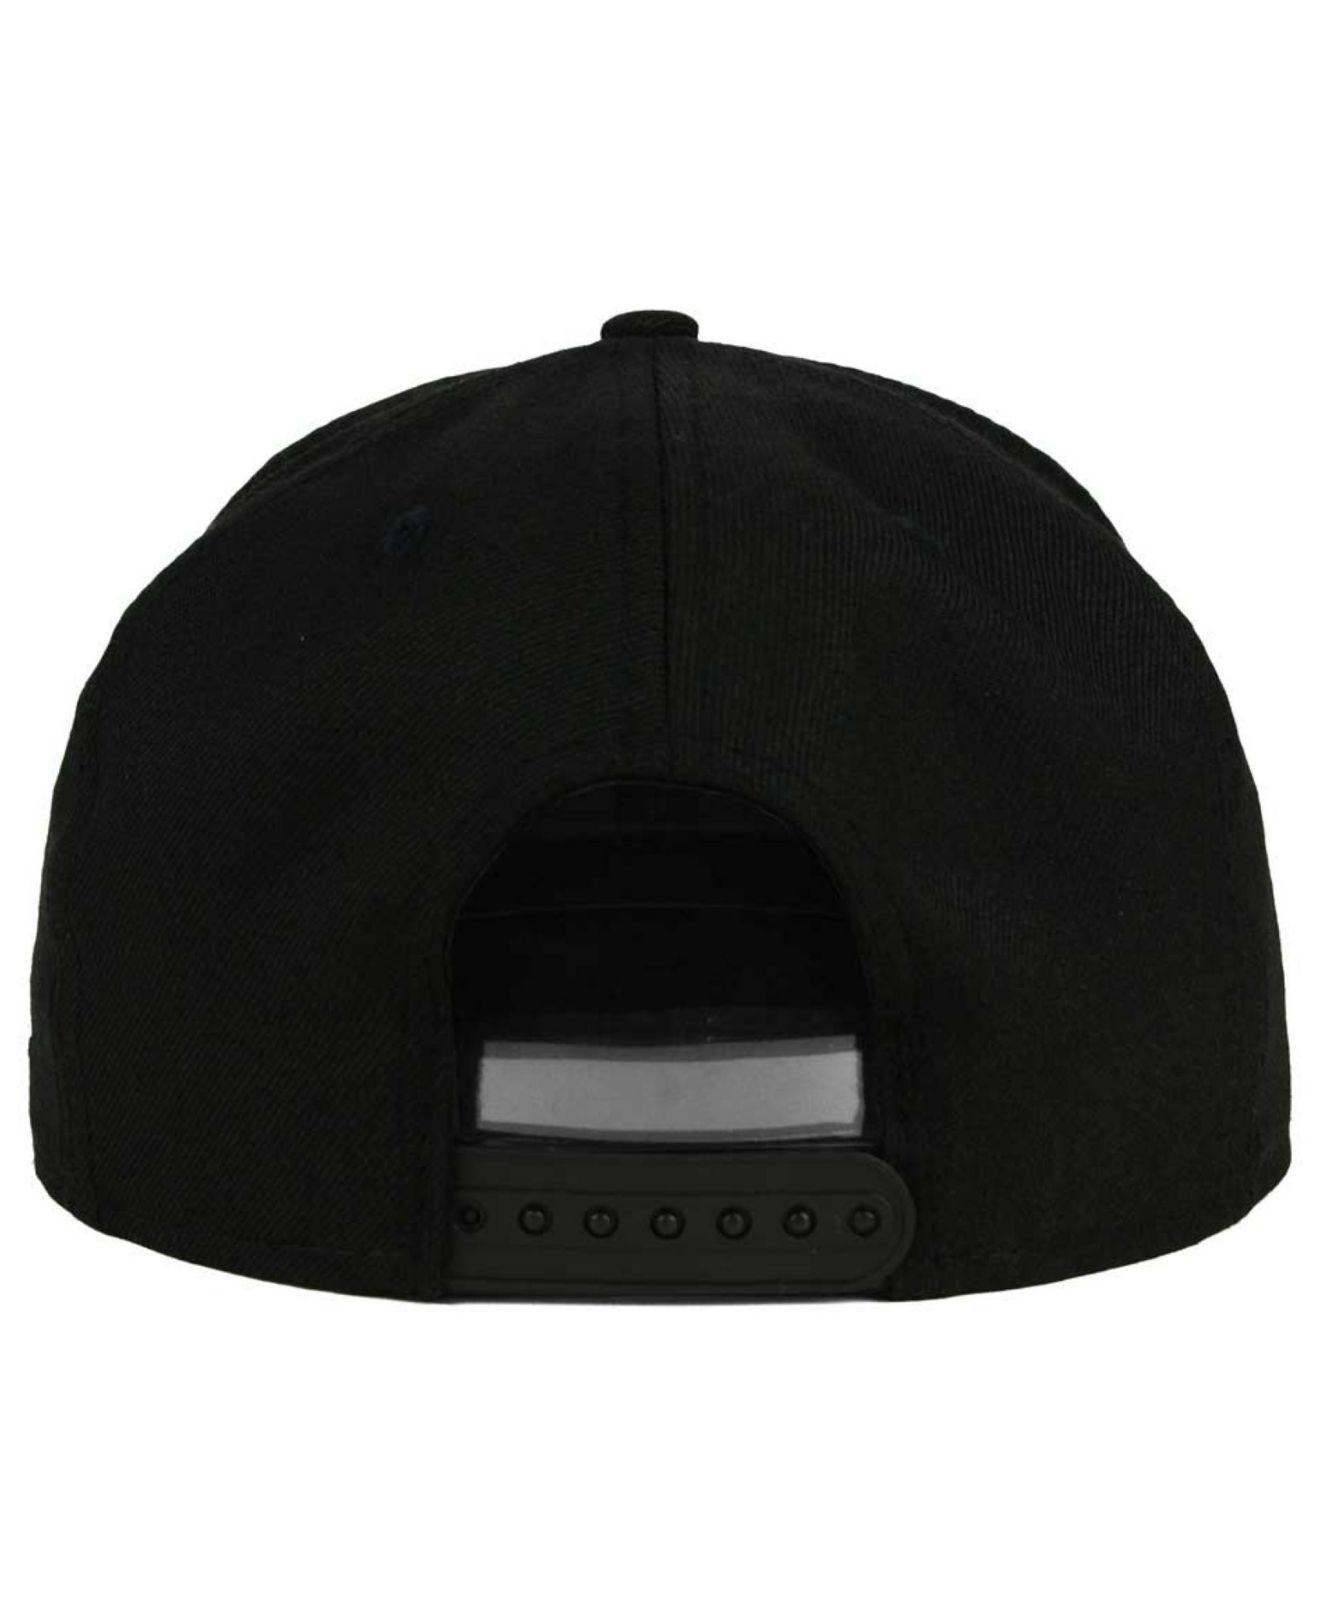 size 40 a608a 515cf ... cheapest philadelphia phillies b dub 9fifty snapback cap for men lyst.  view fullscreen dc783 08ecf